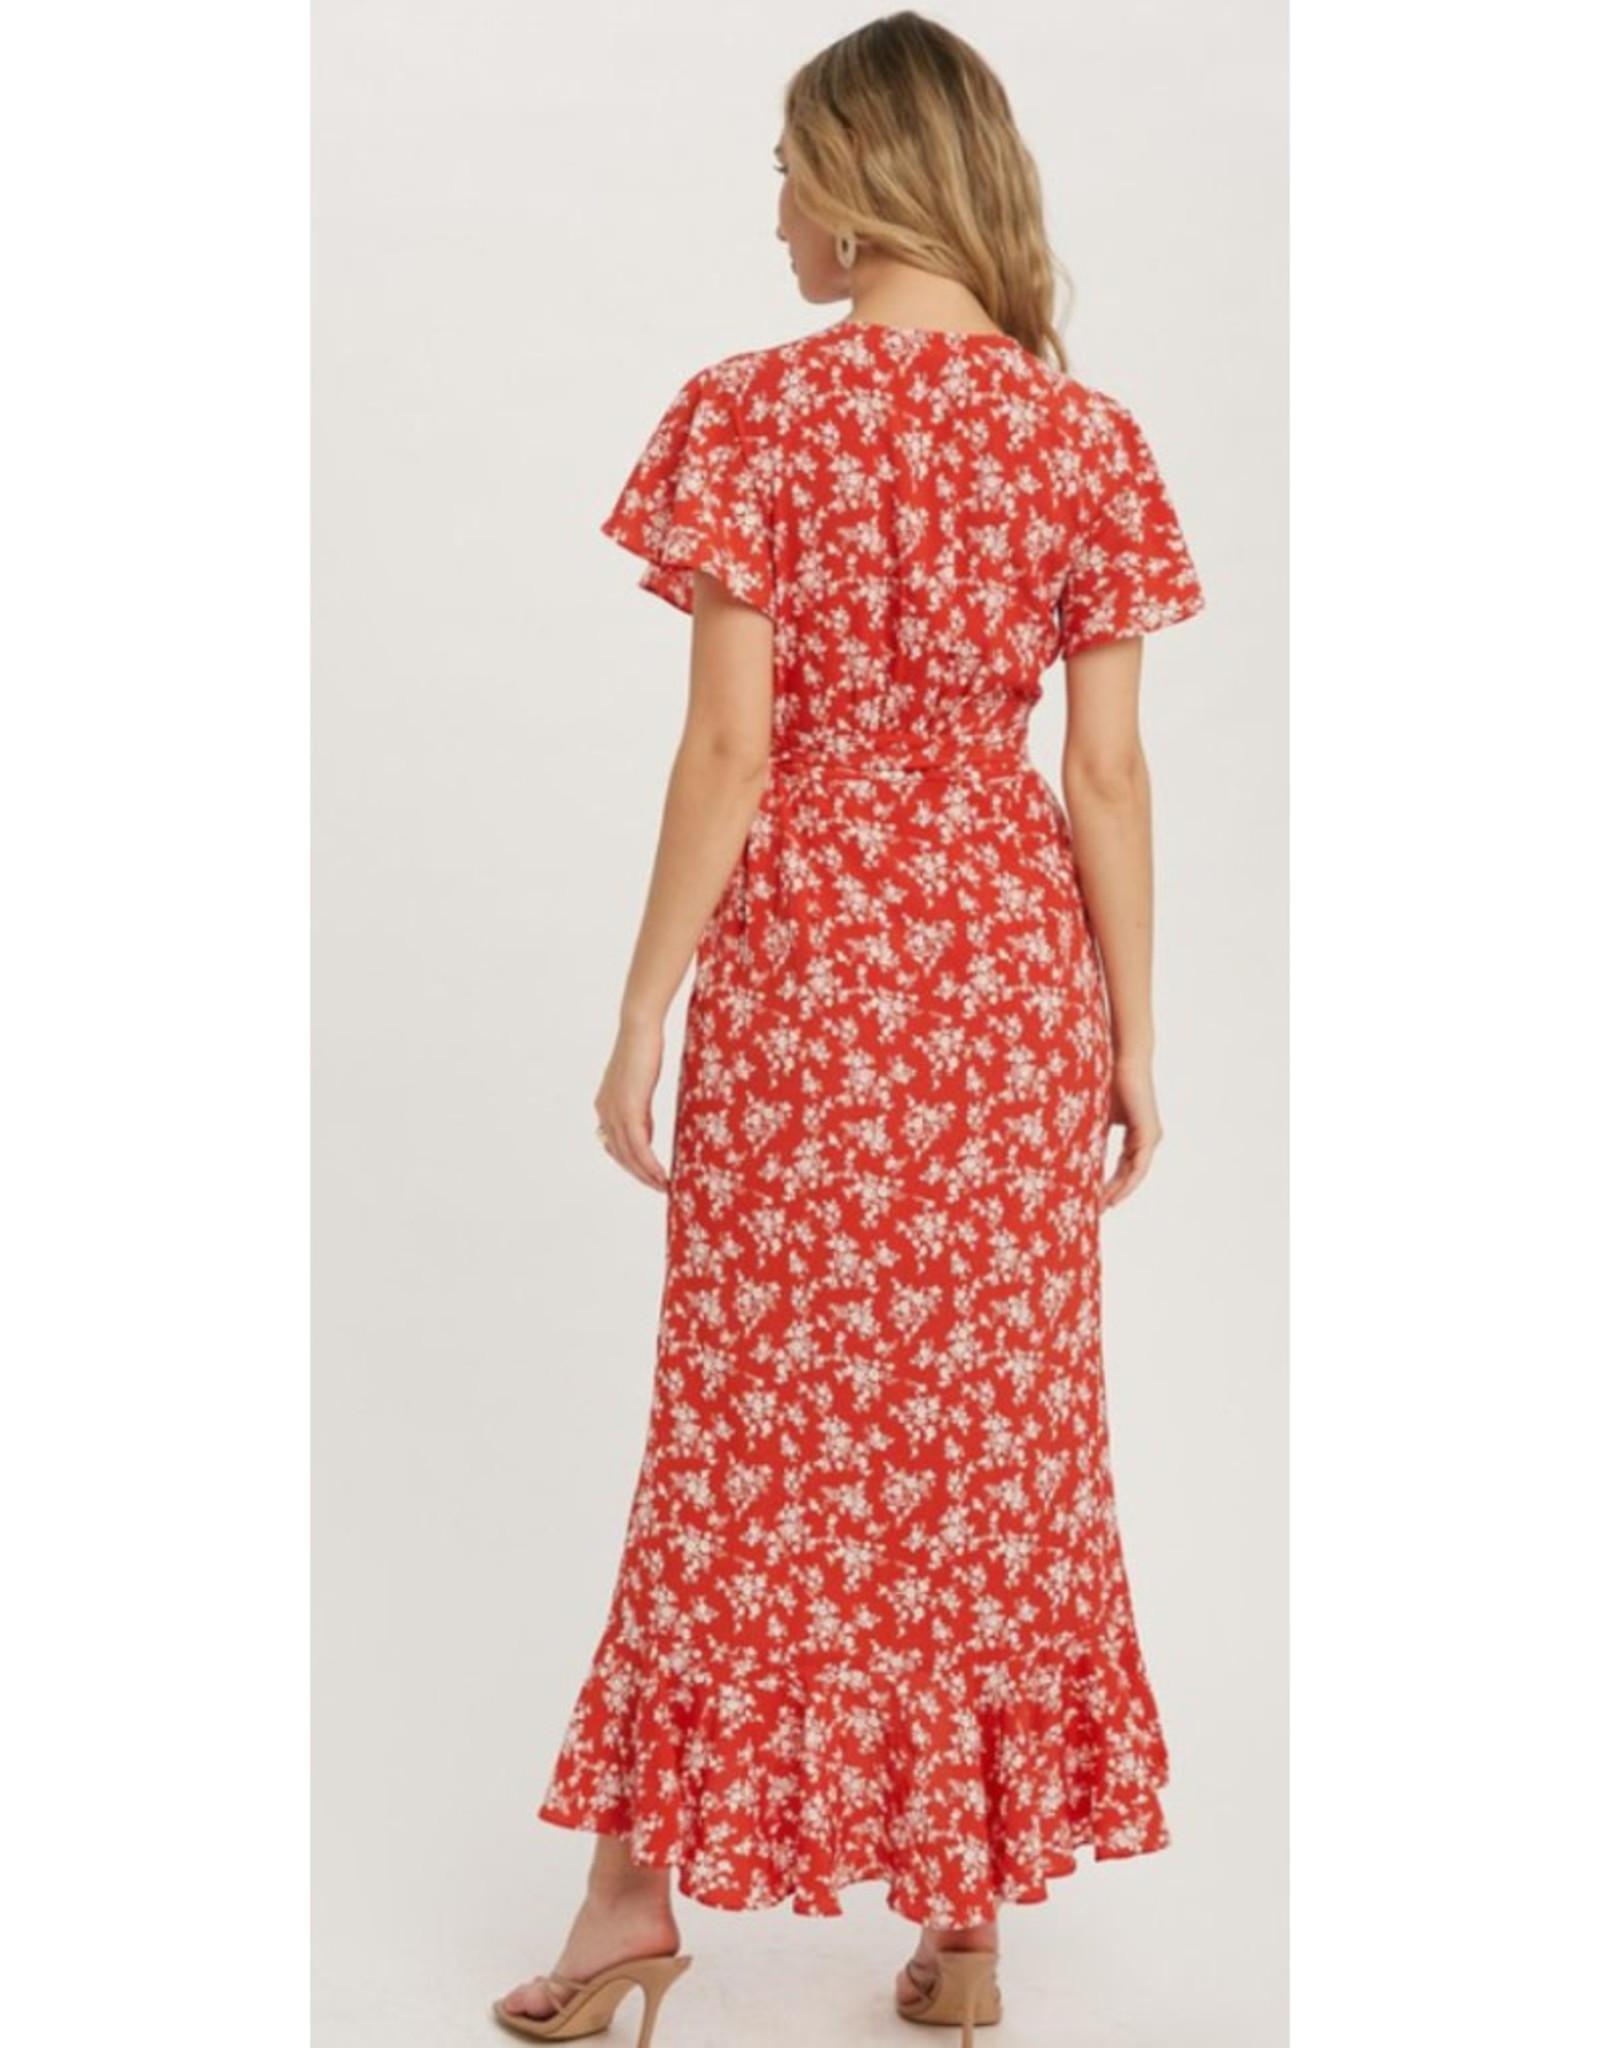 Ditsy Floral Wrap Dress - Tomato